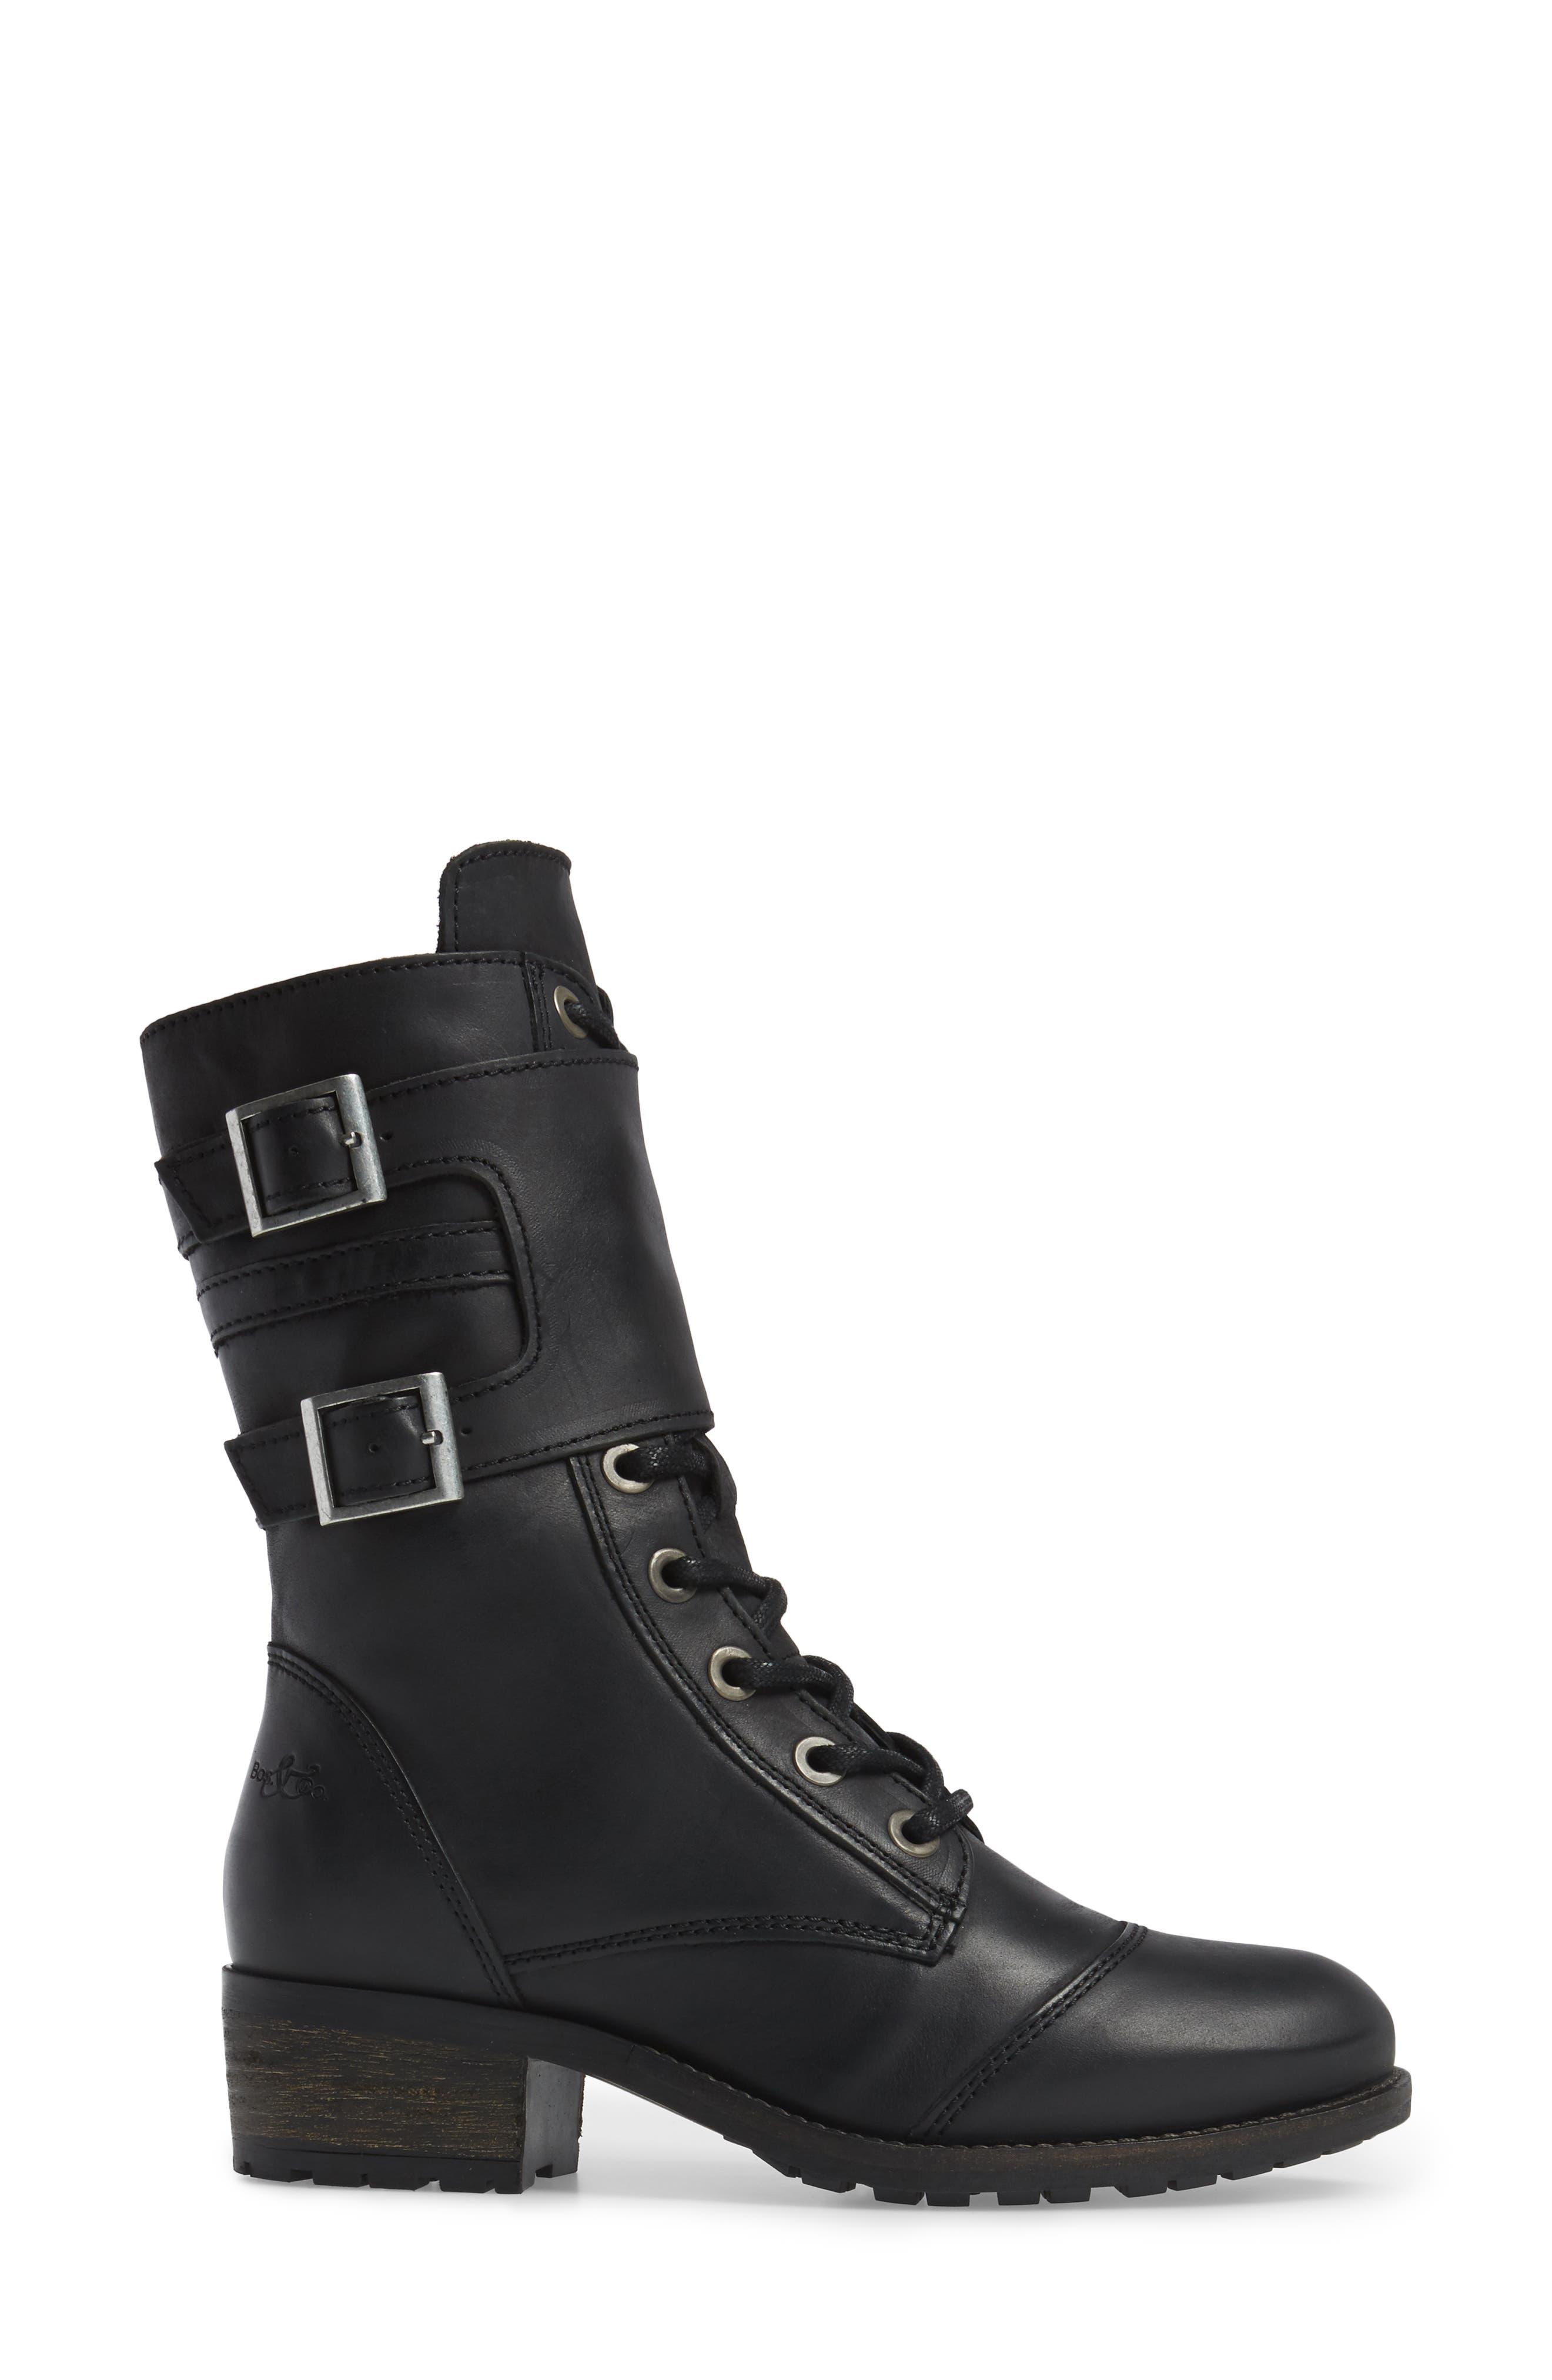 Lune Waterproof Moto Boot,                             Alternate thumbnail 3, color,                             Black Varese Leather